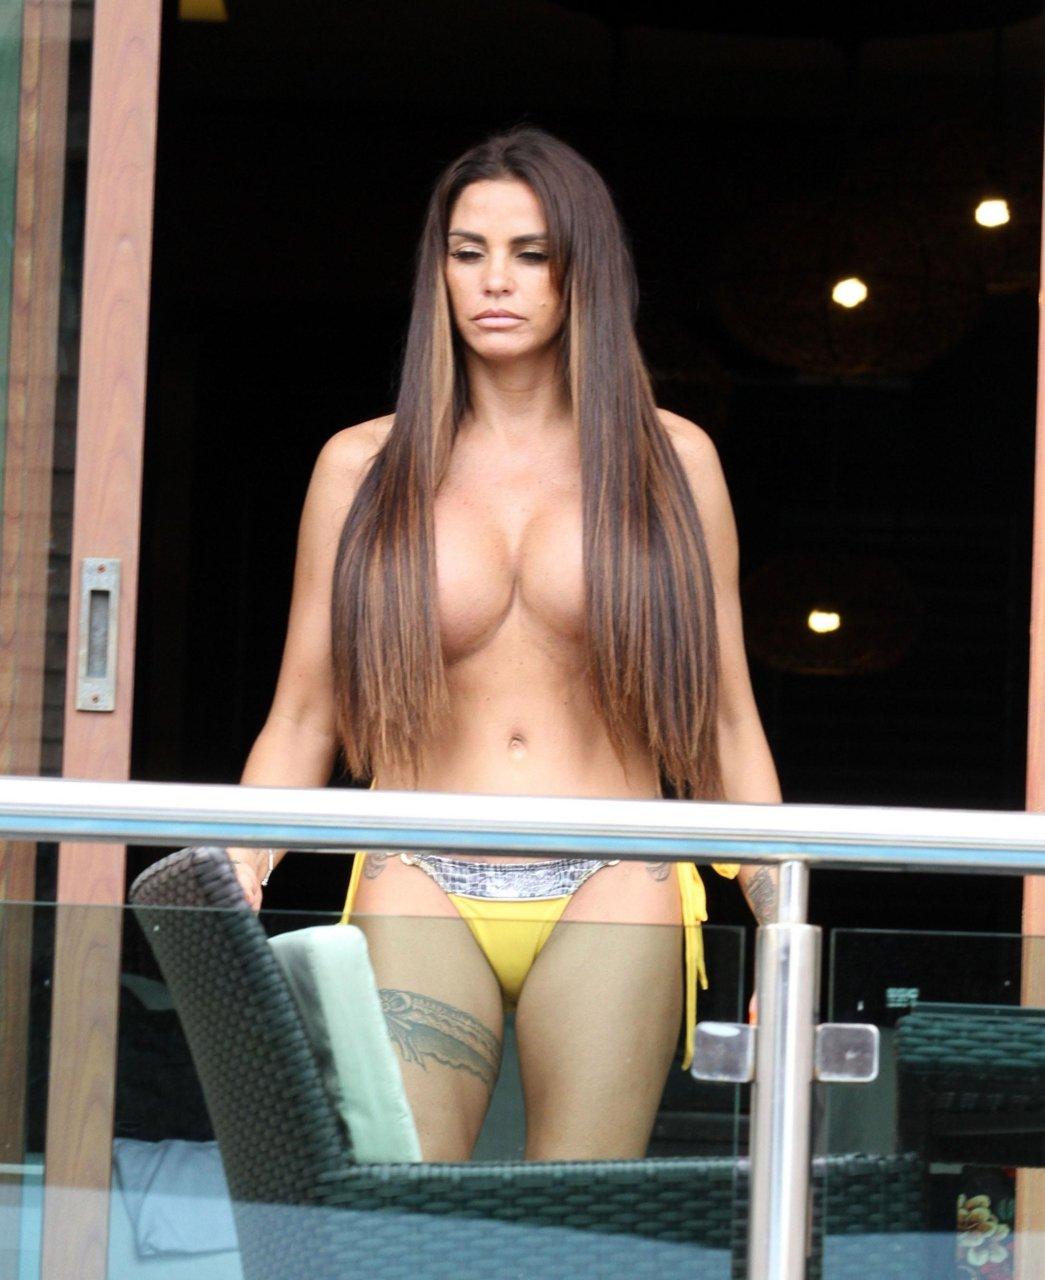 Katie-Price-Nude-TheFappeningBlog.com-11.jpg